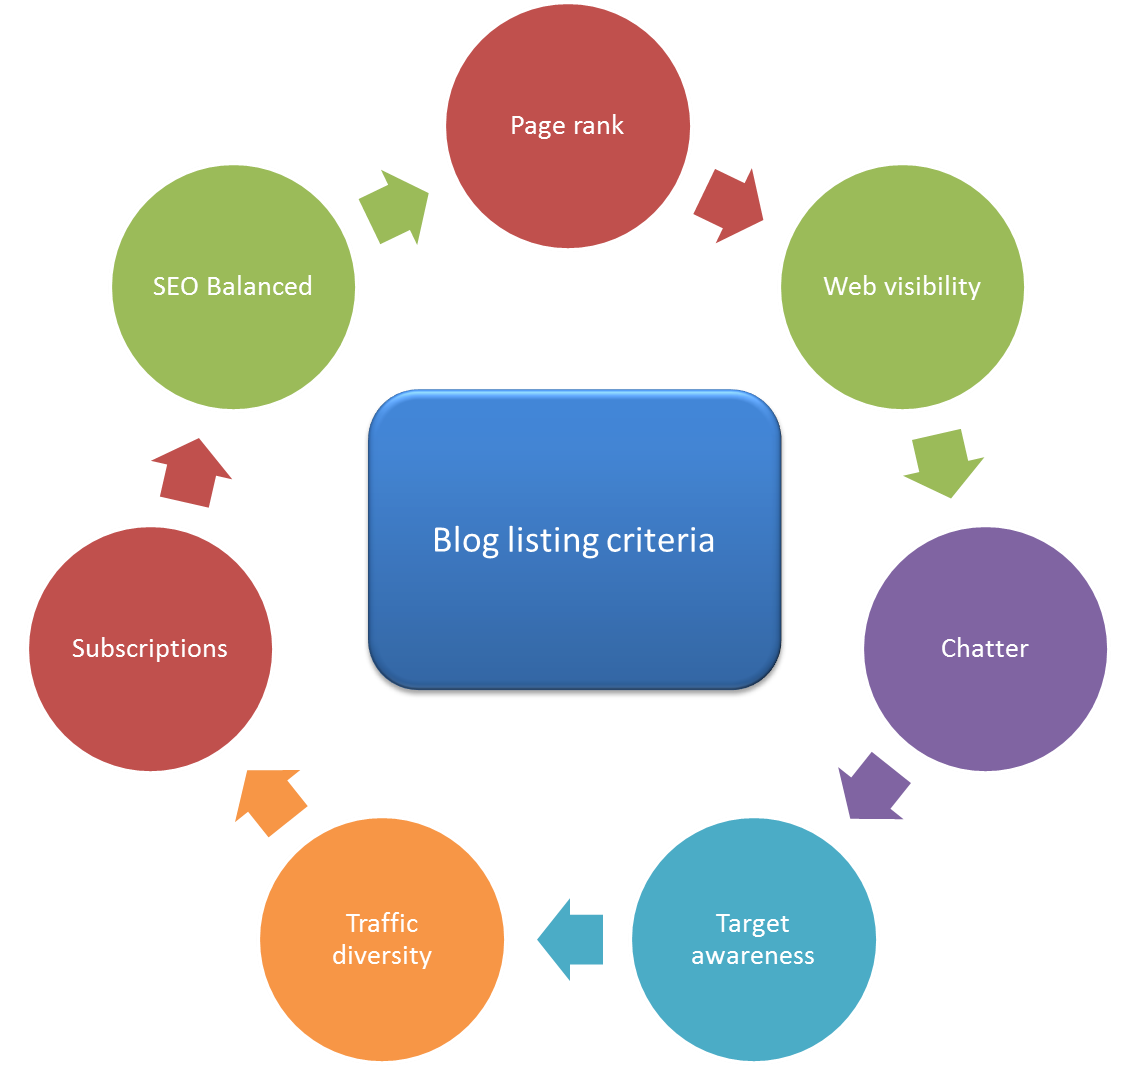 Blog-listing-criteria